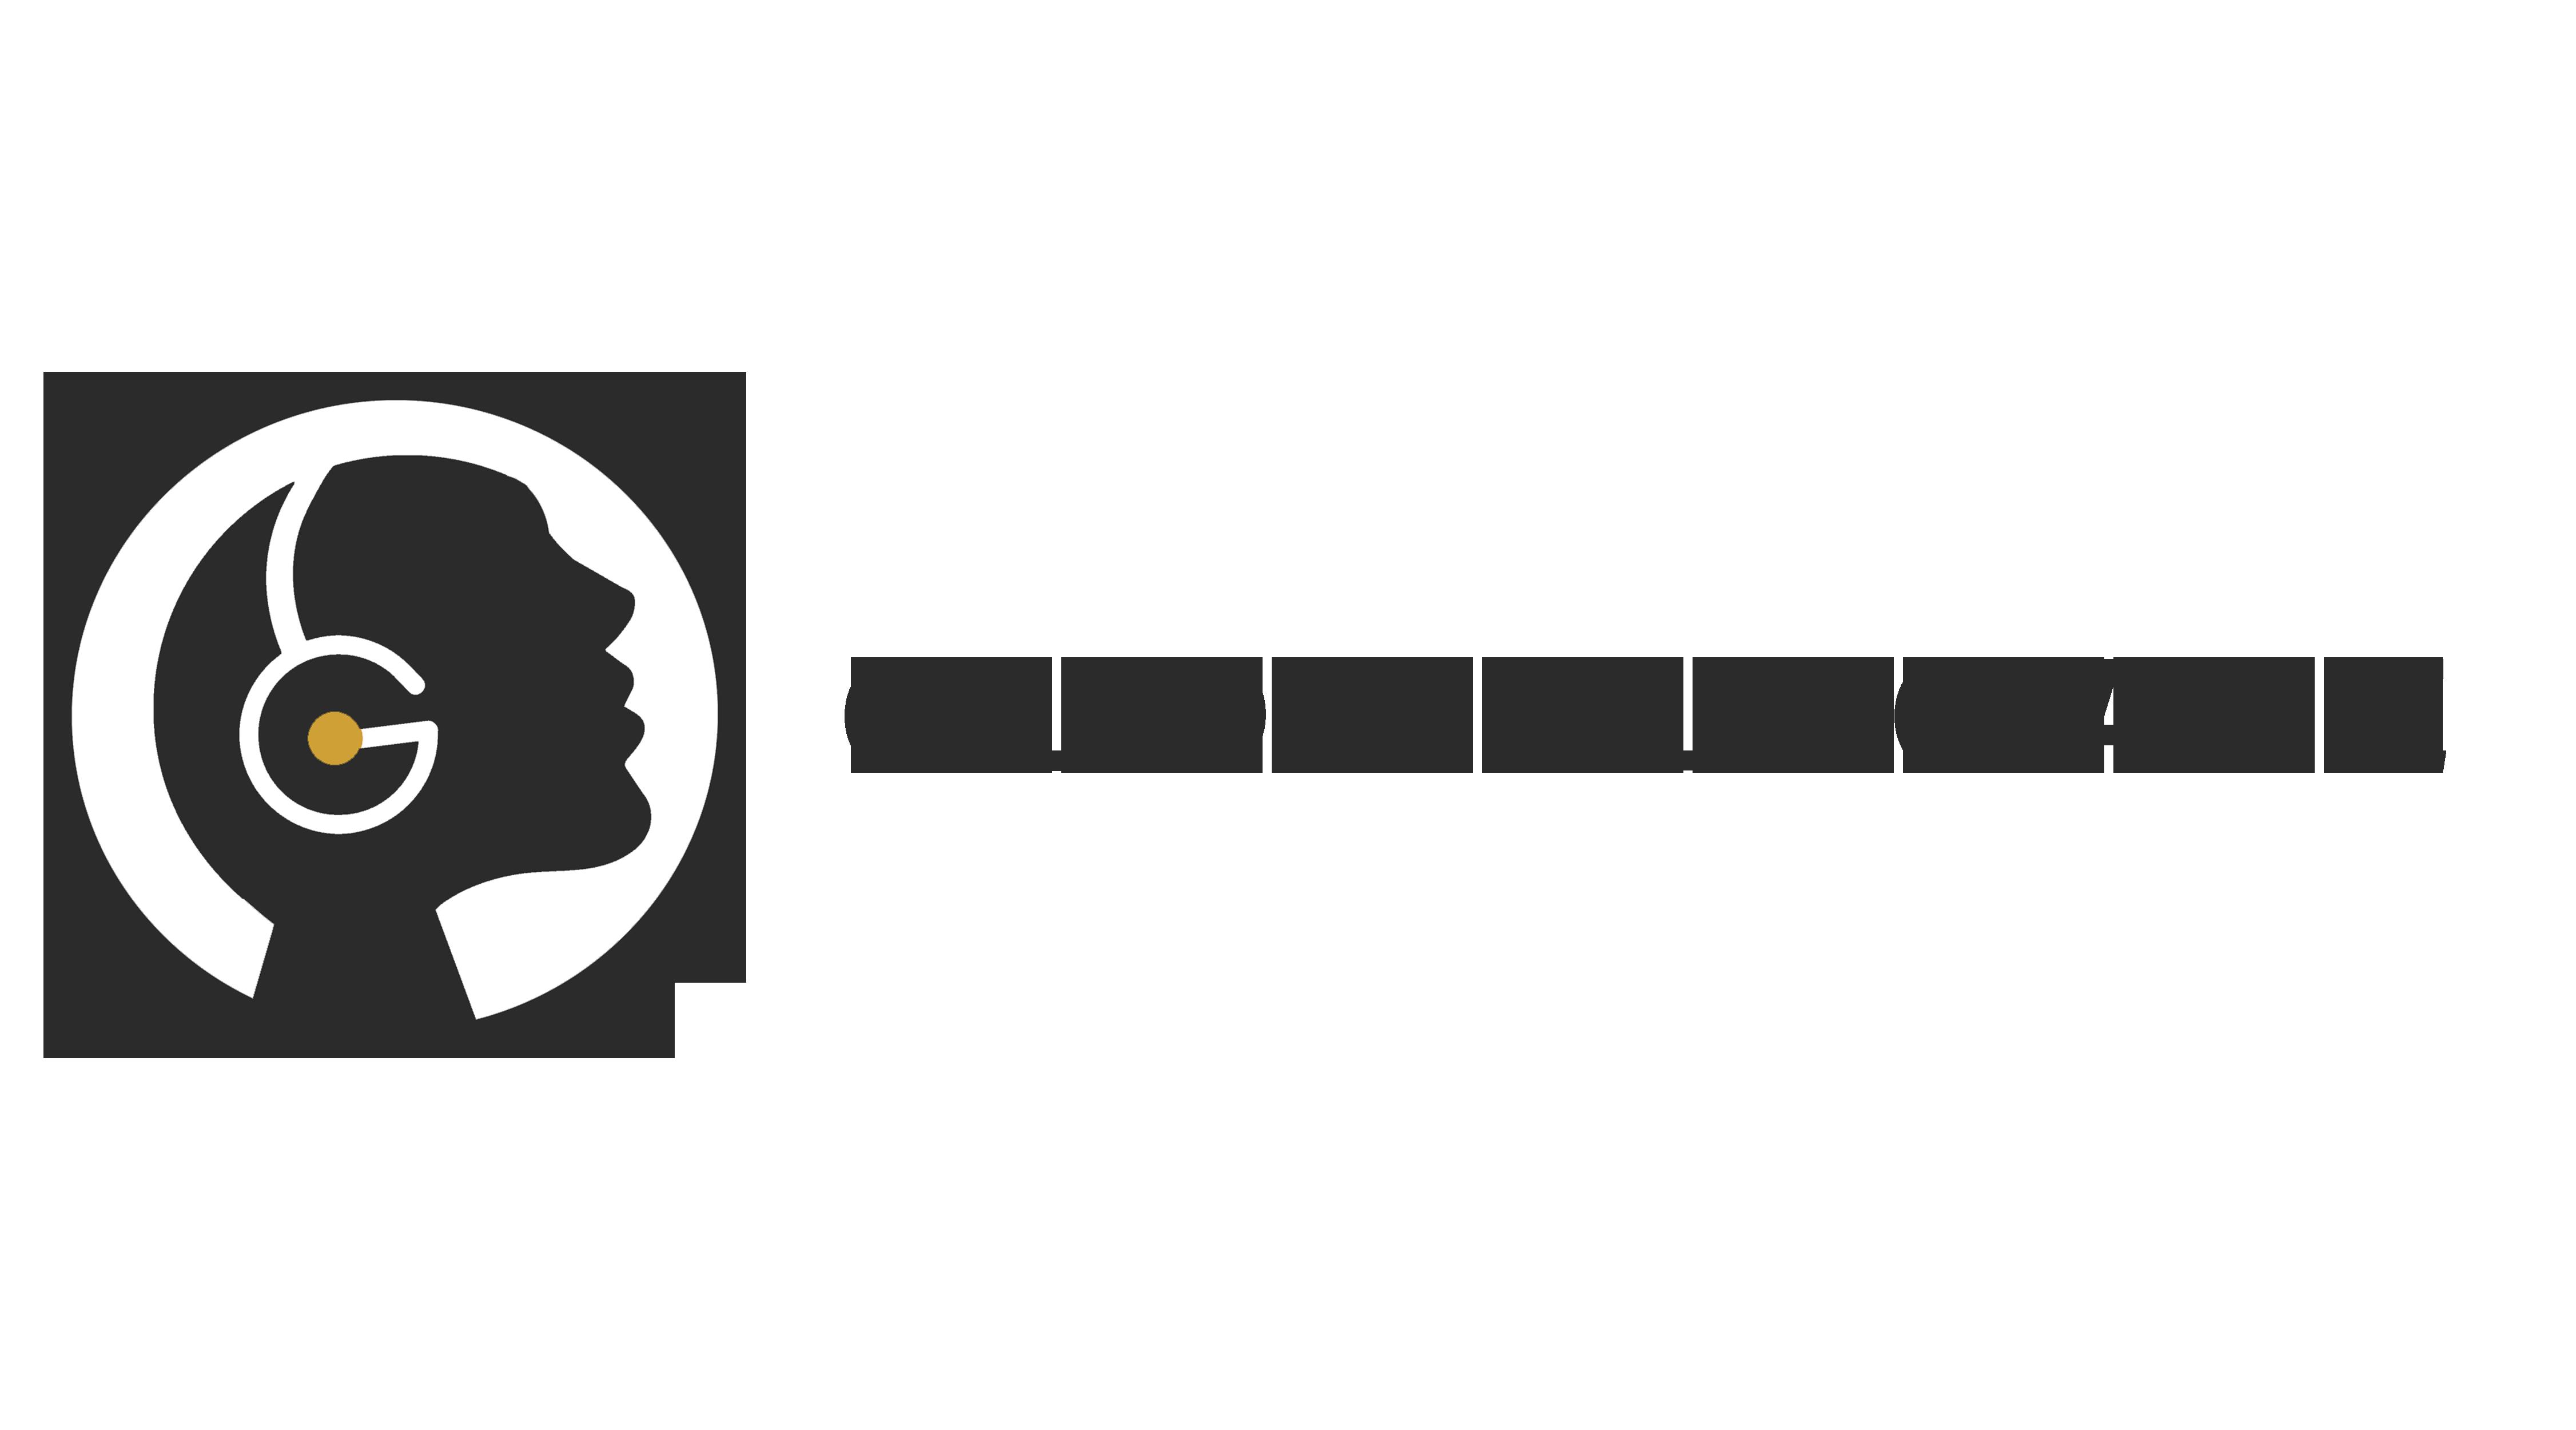 فروشگاه اینترنتی گلوبال گیت Global Gate